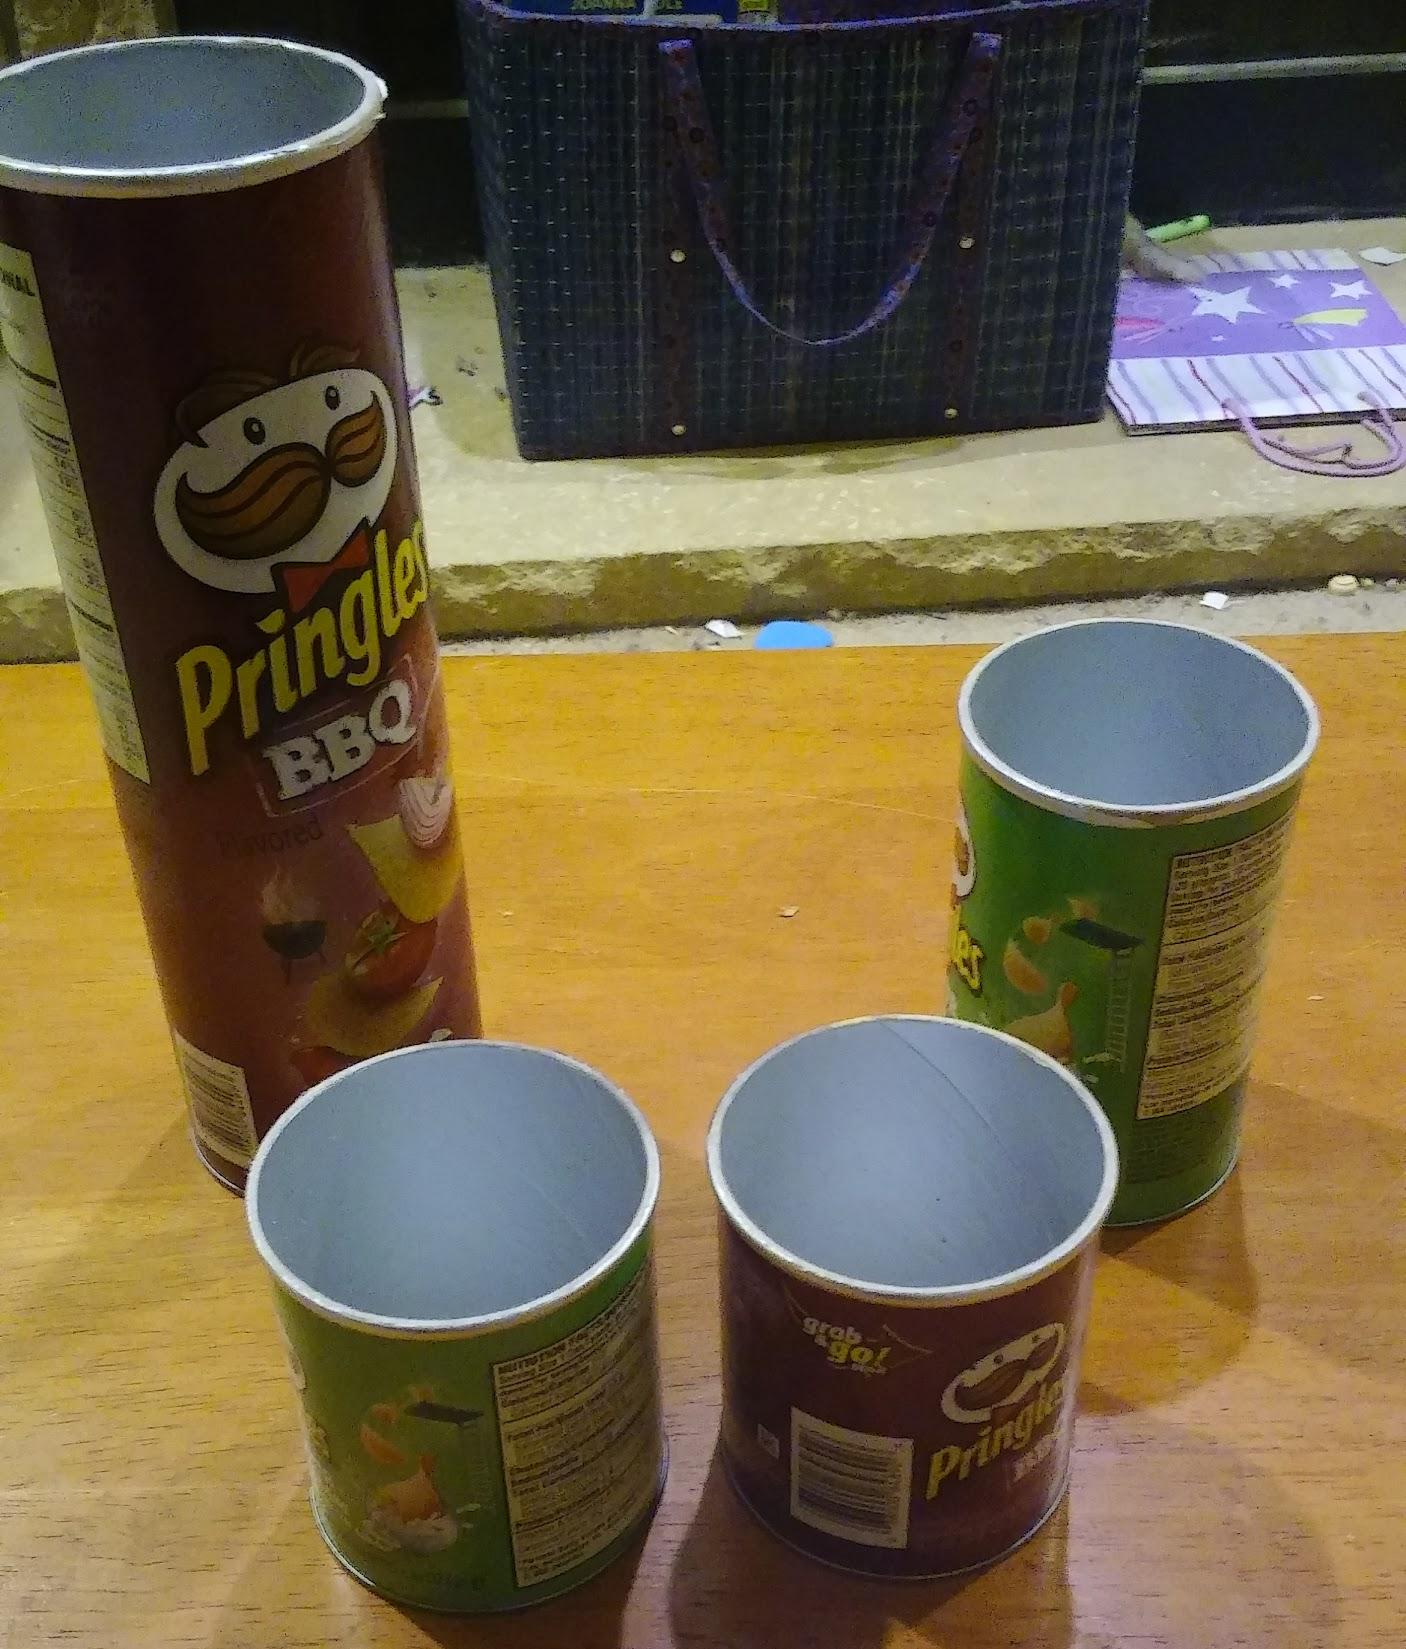 Pringles cans.jpg